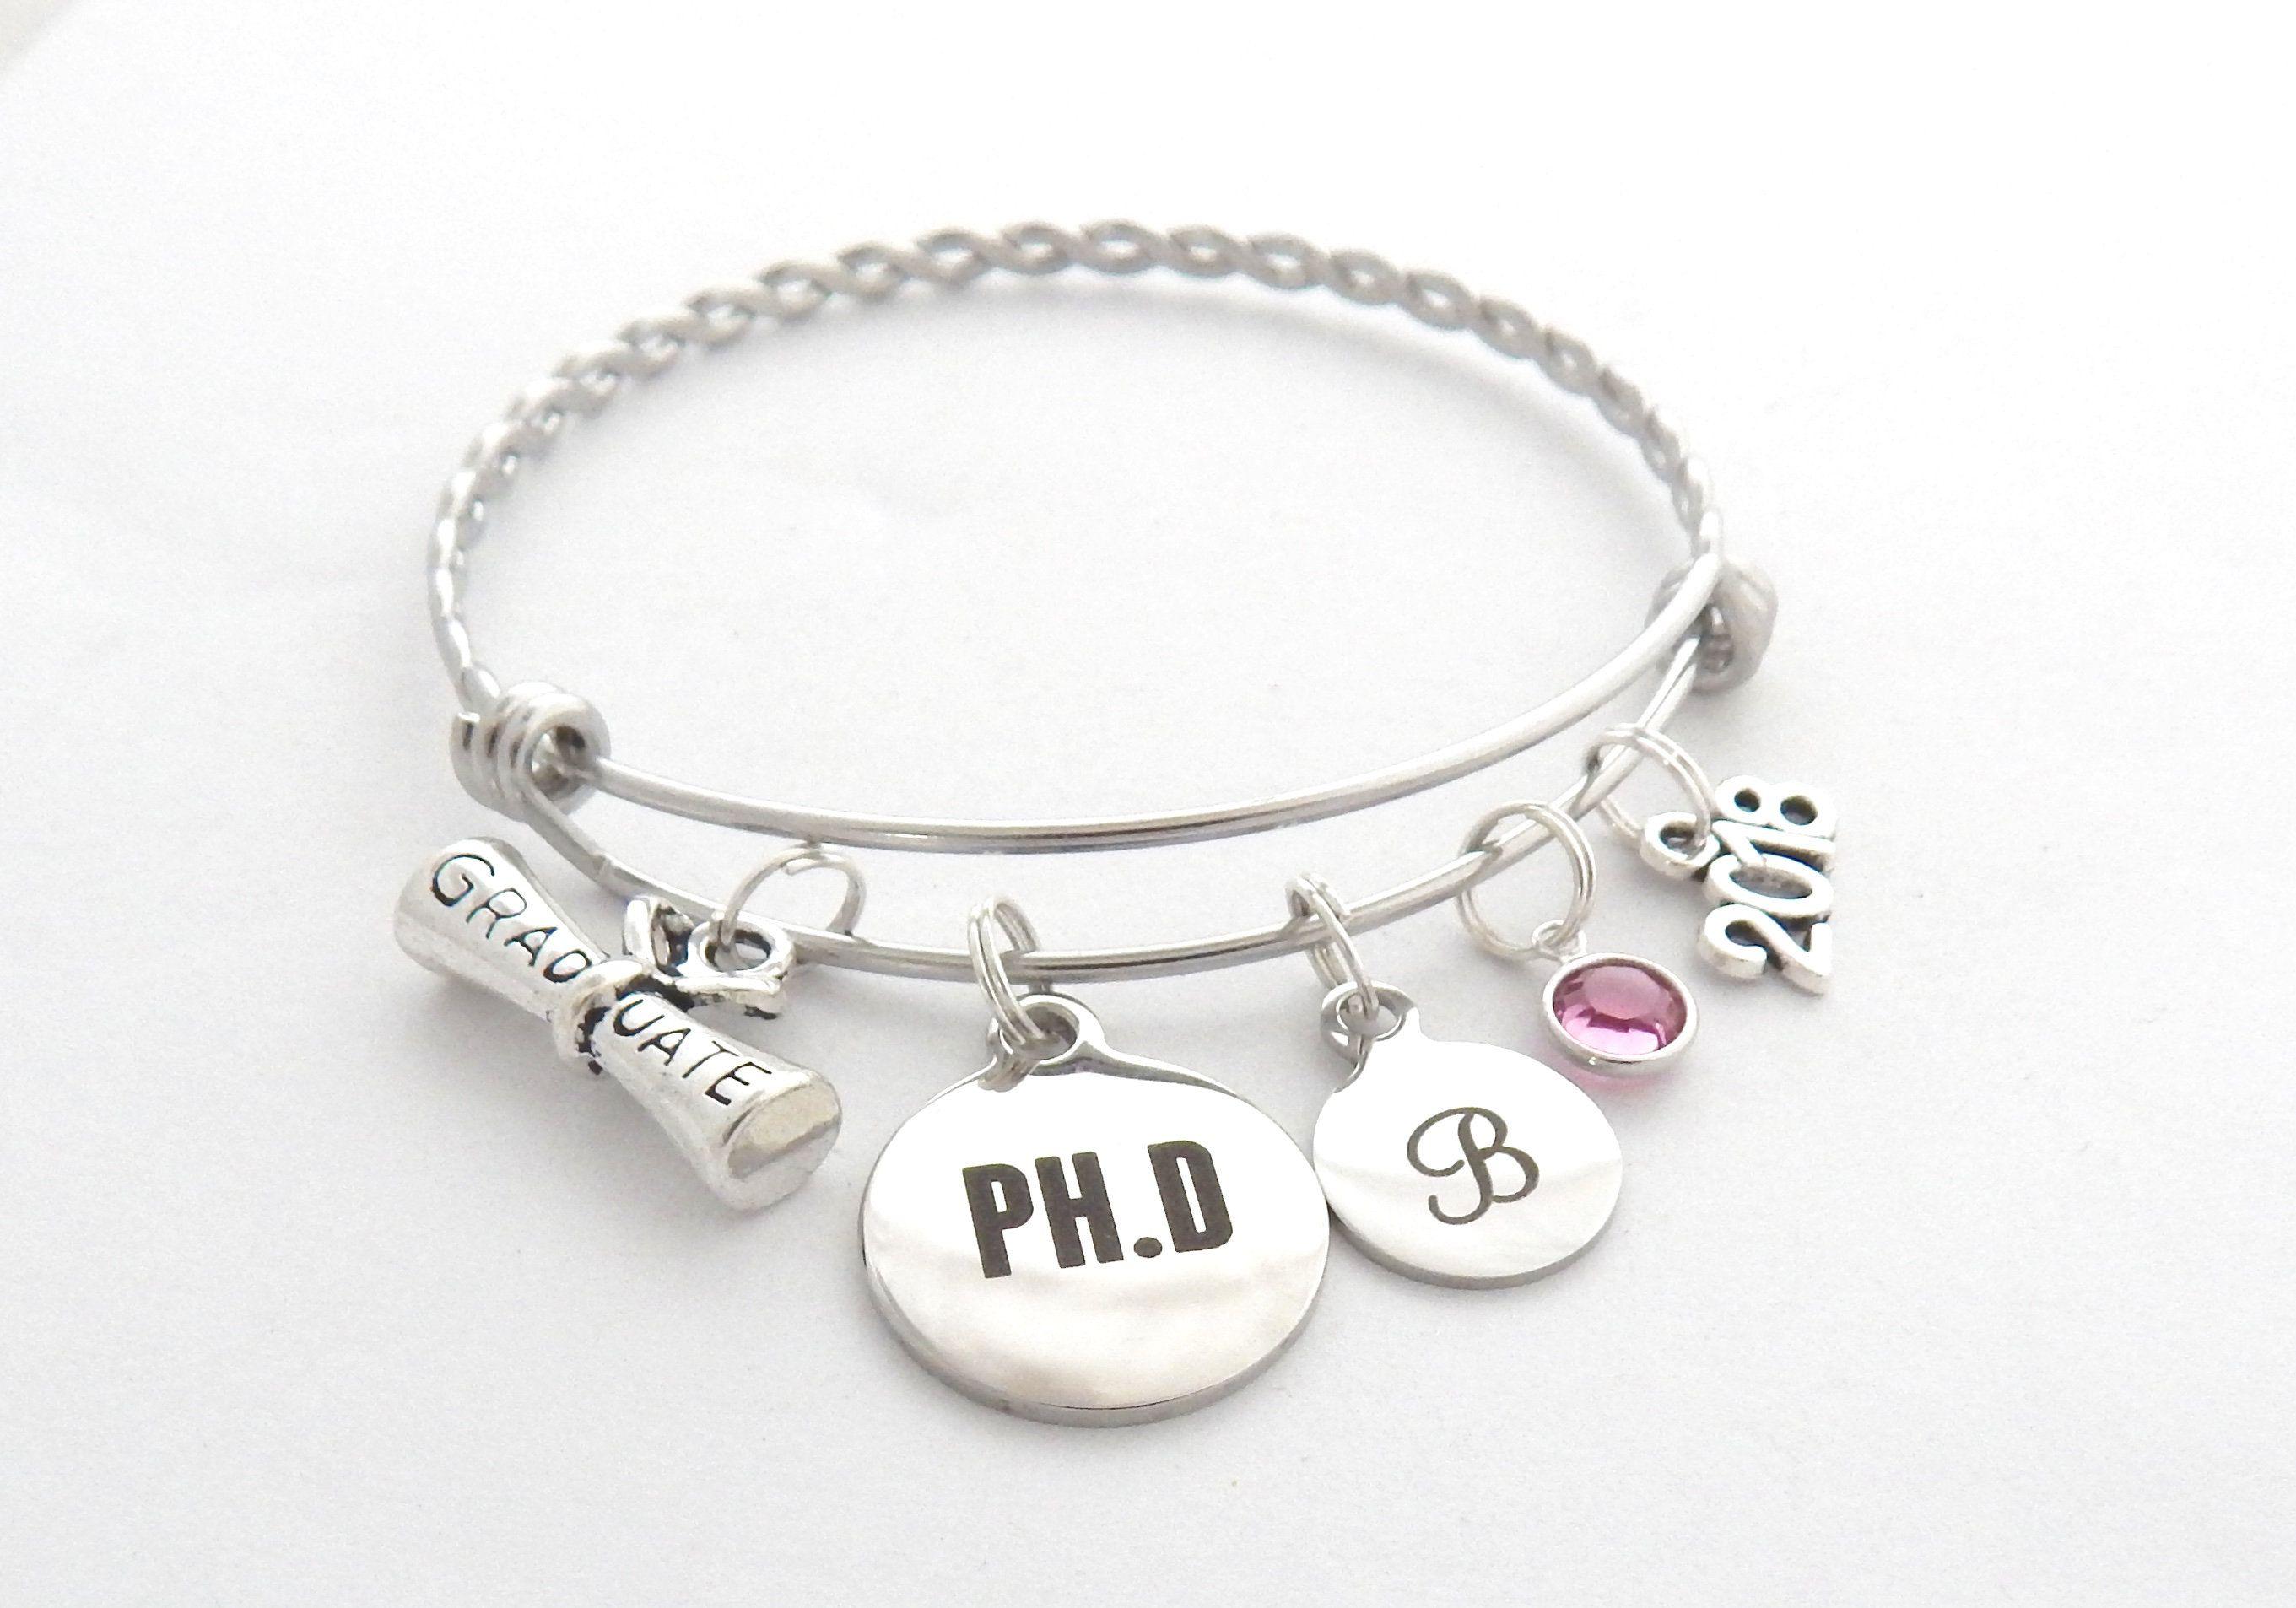 23f99ad8f PhD Gift, PhD Graduation Bracelet, PhD Jewelry, PhD Science Biology  Chemistry College Graduation, Doctor of Philosophy, University Graduate